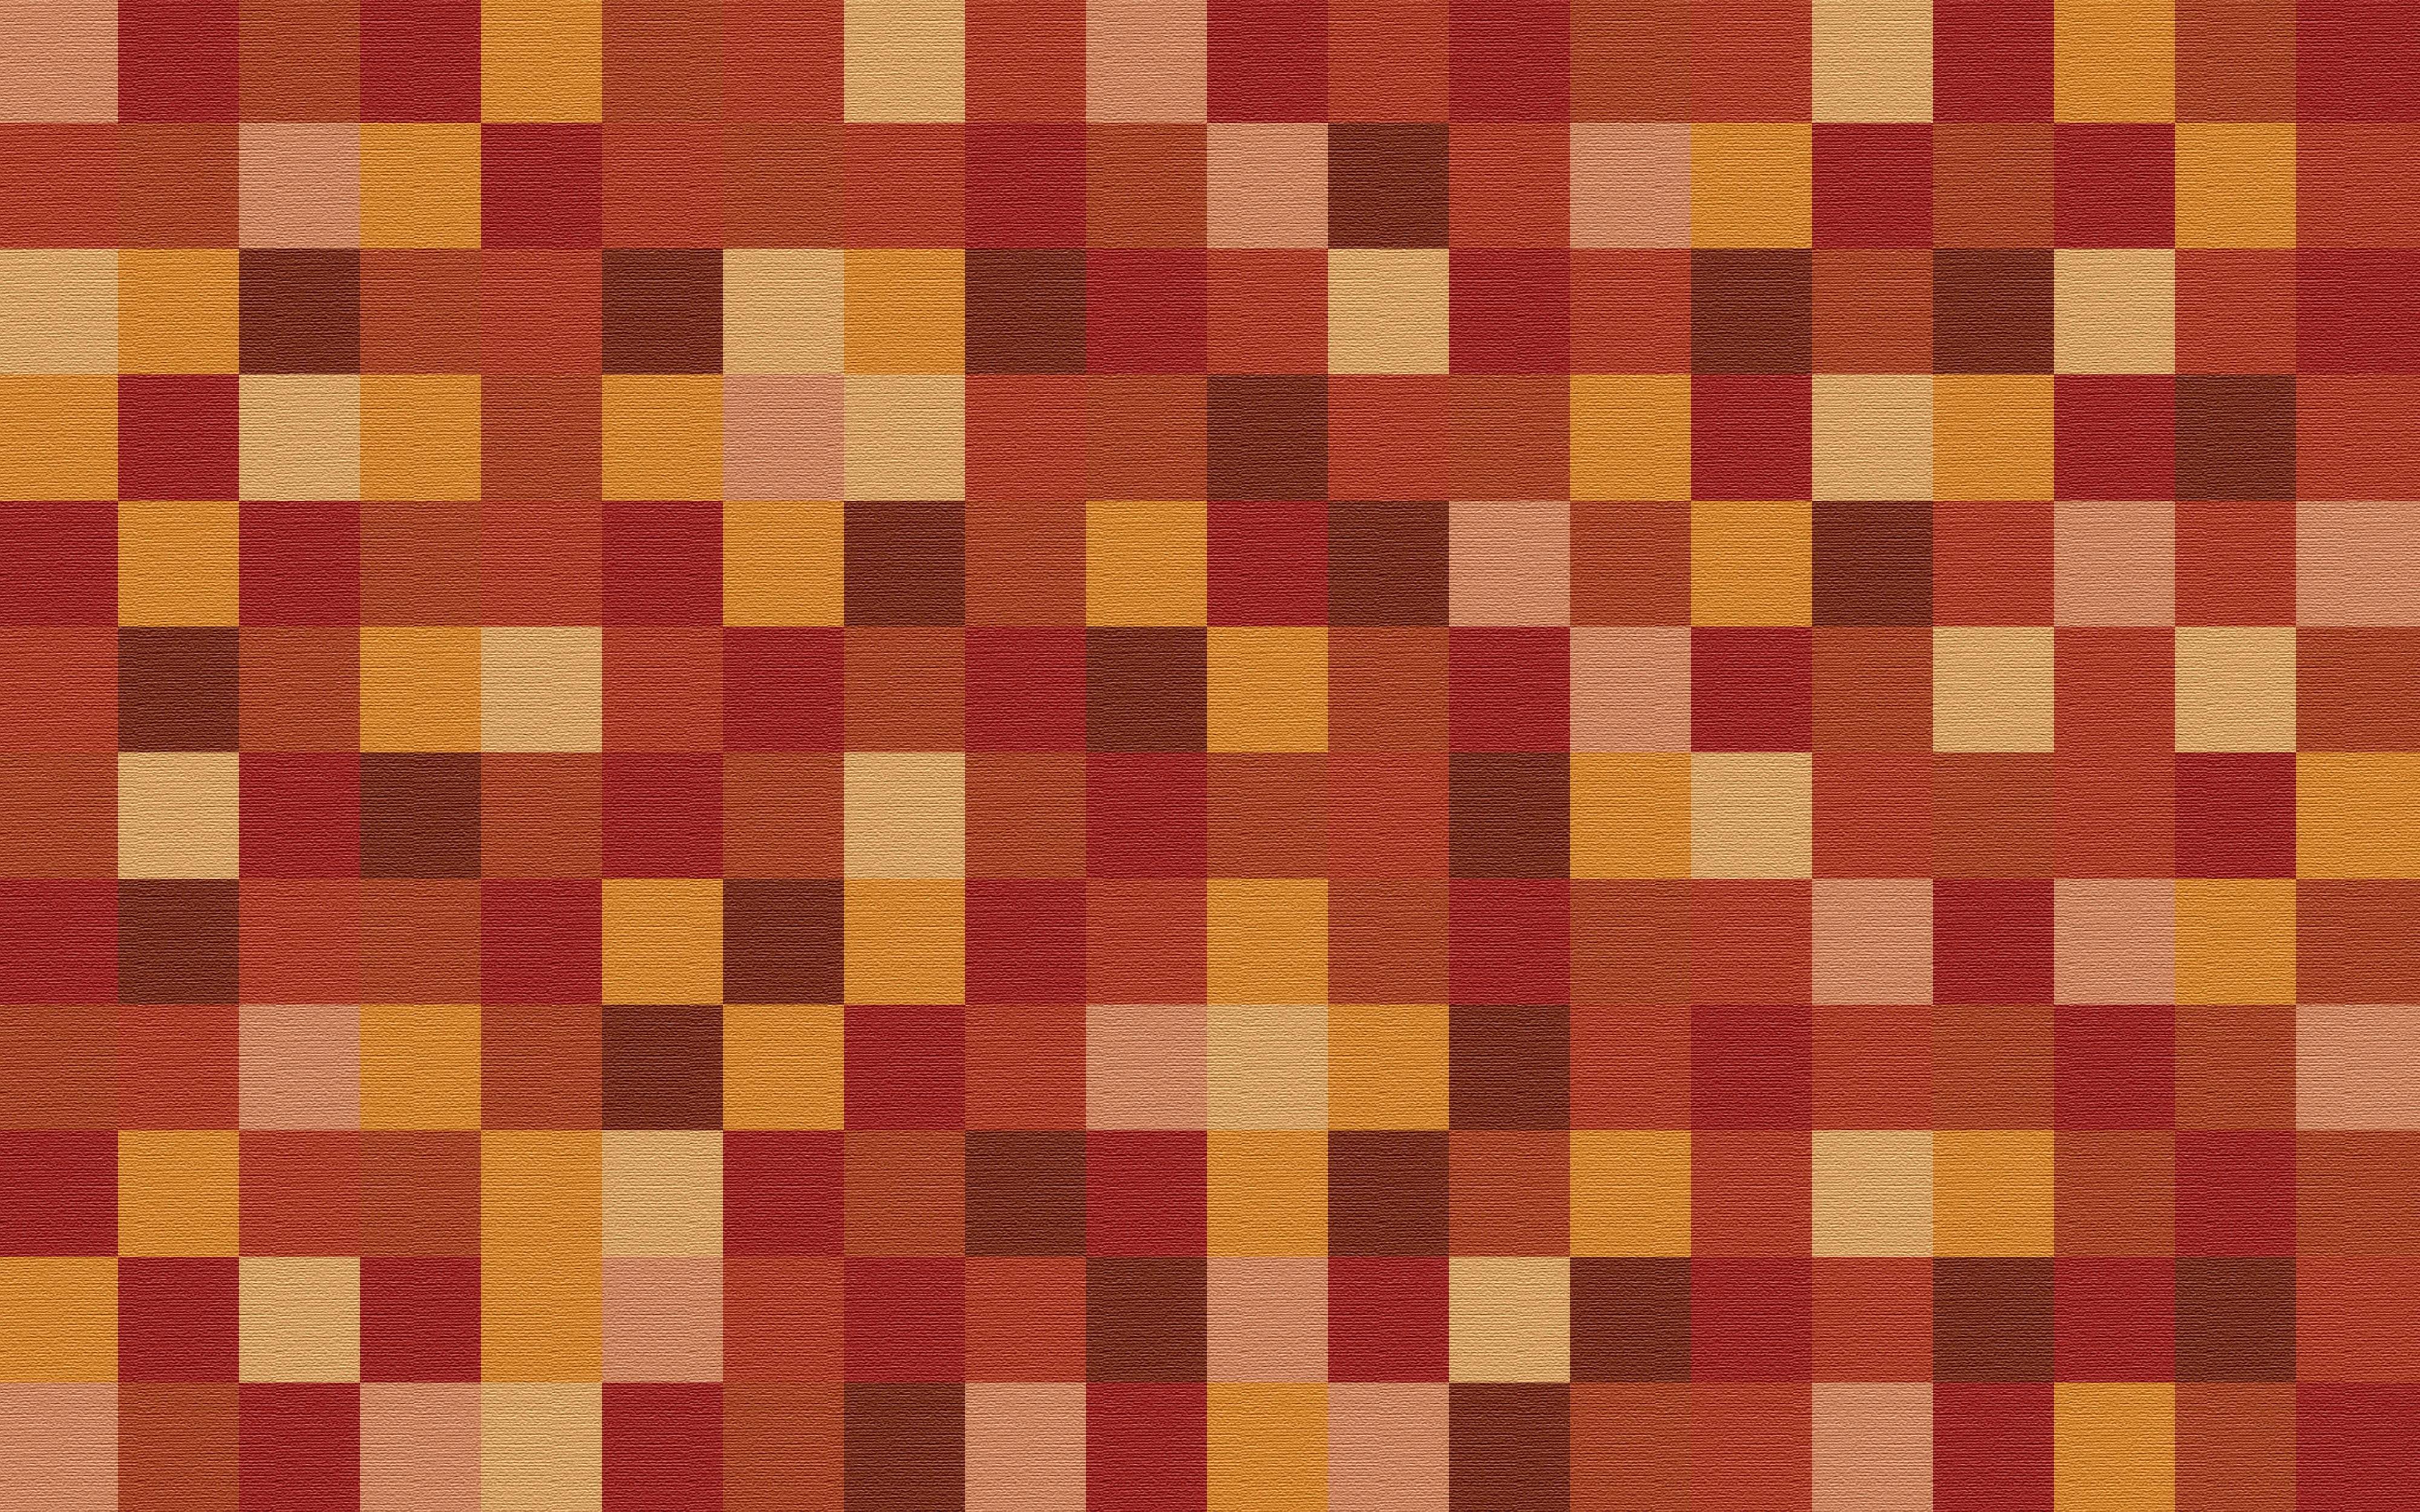 grid paper designs